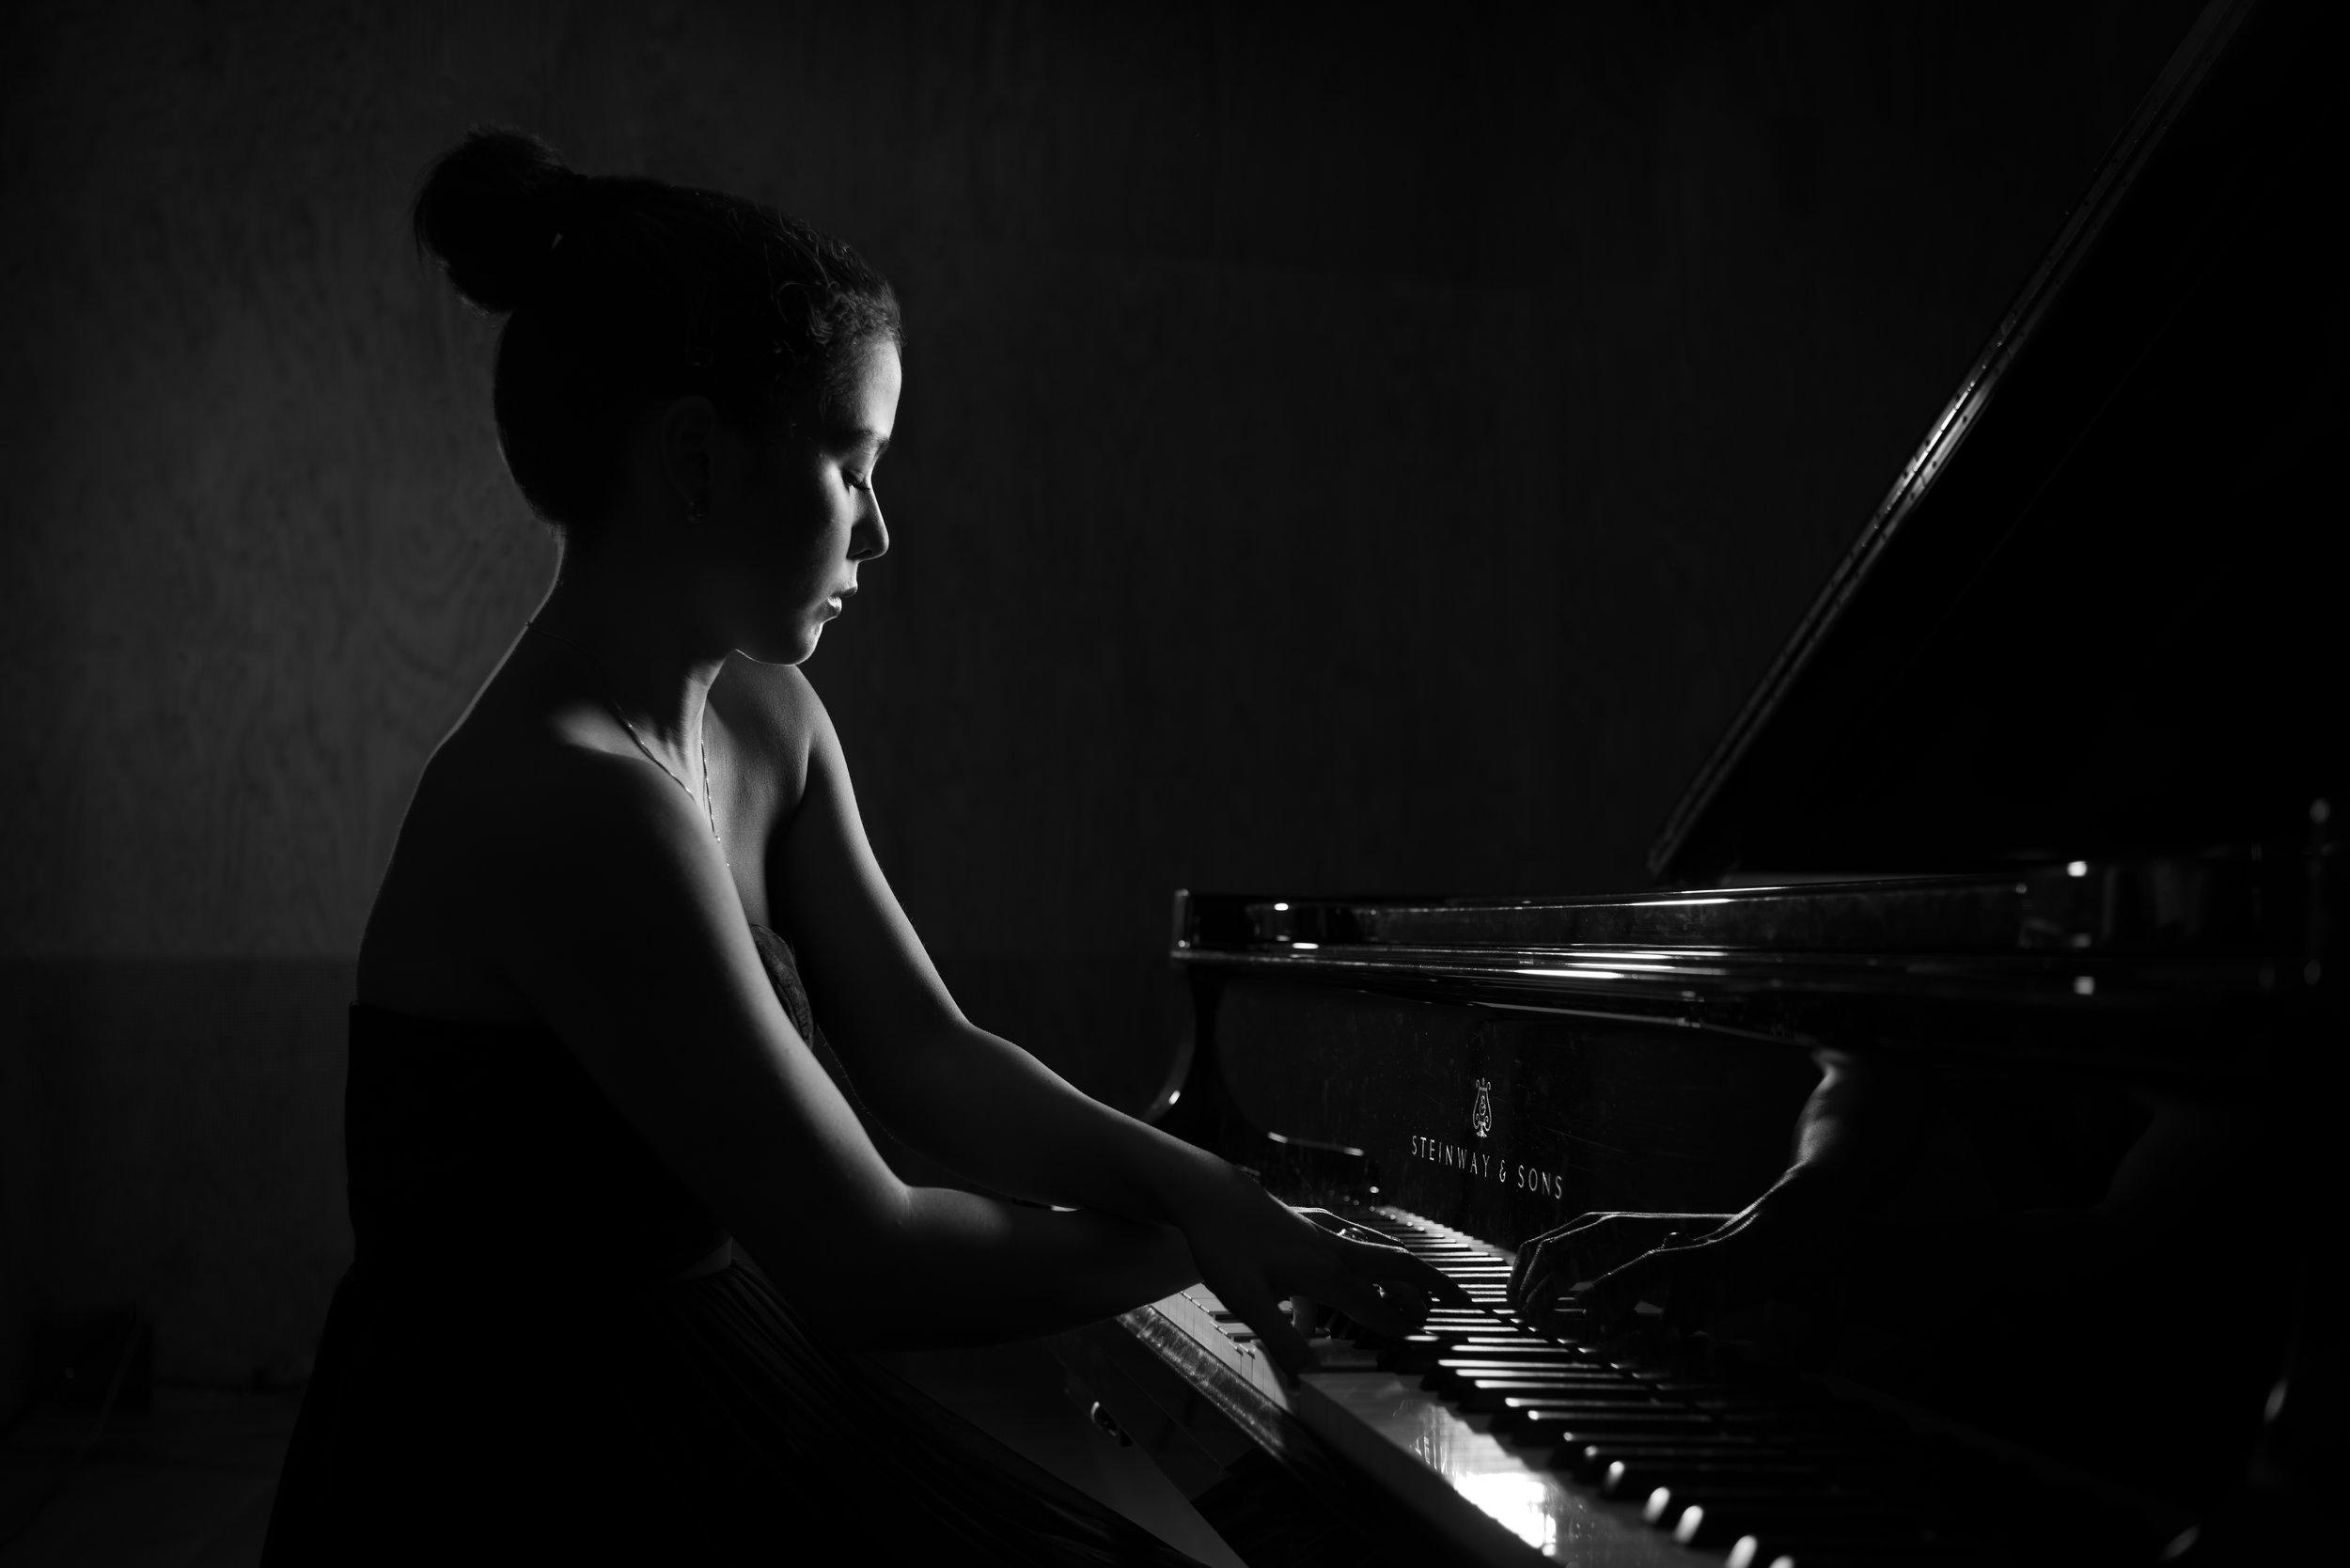 Classical pianist Anna Bertogna. Shot for my website www.shotsofmusic.com.